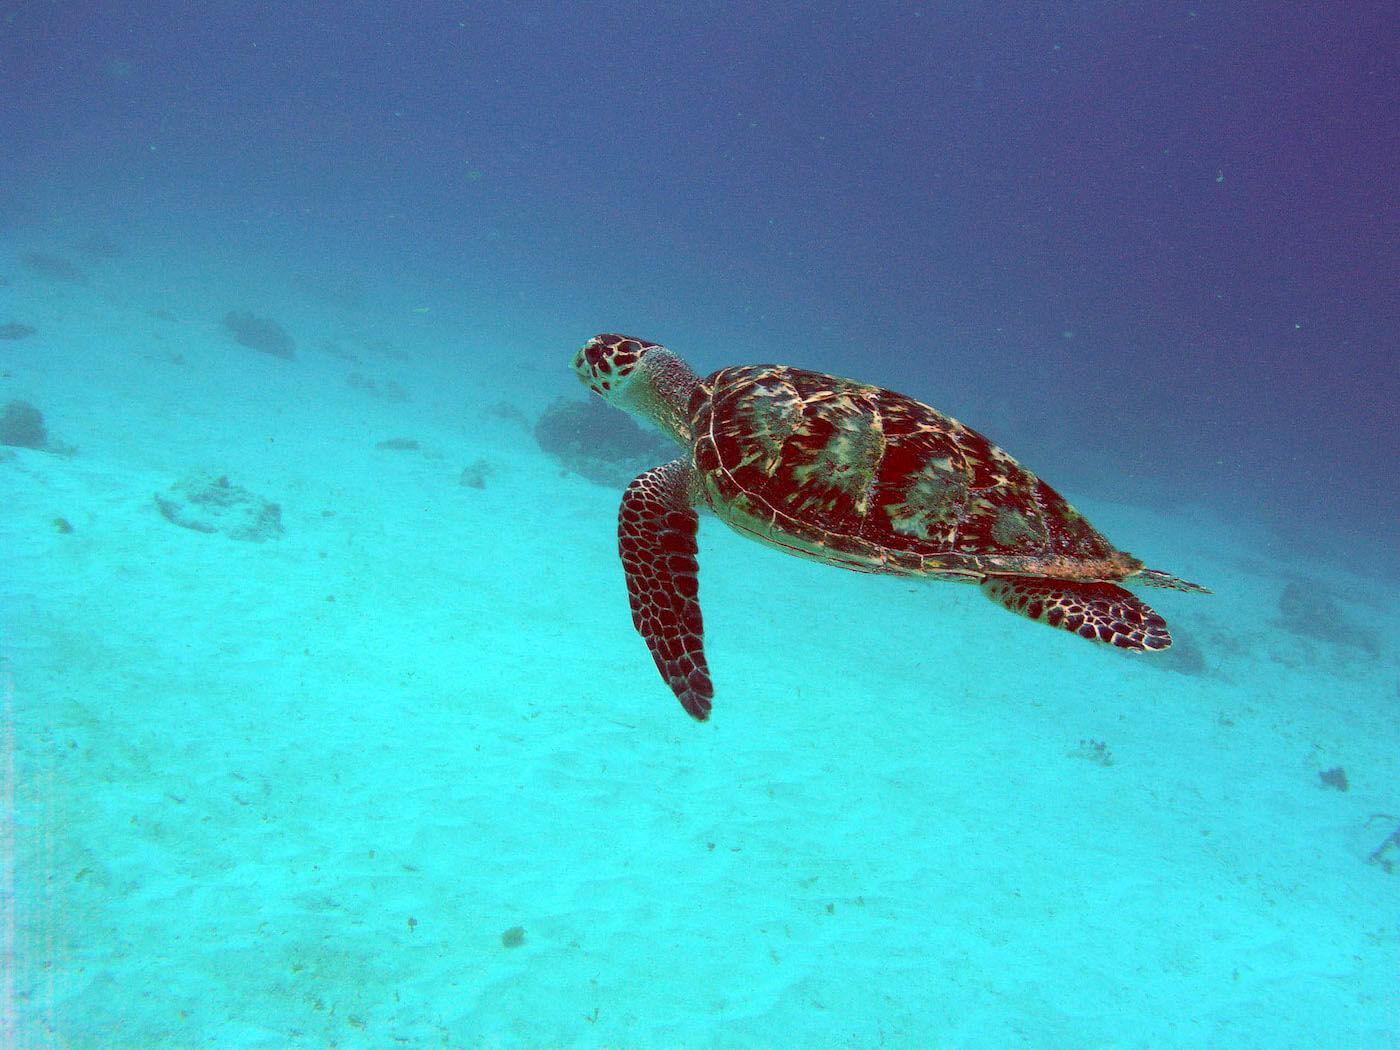 Isla Mujeres Scuba Diving Snorkeling Manchones Reef Squalo Adventures-31